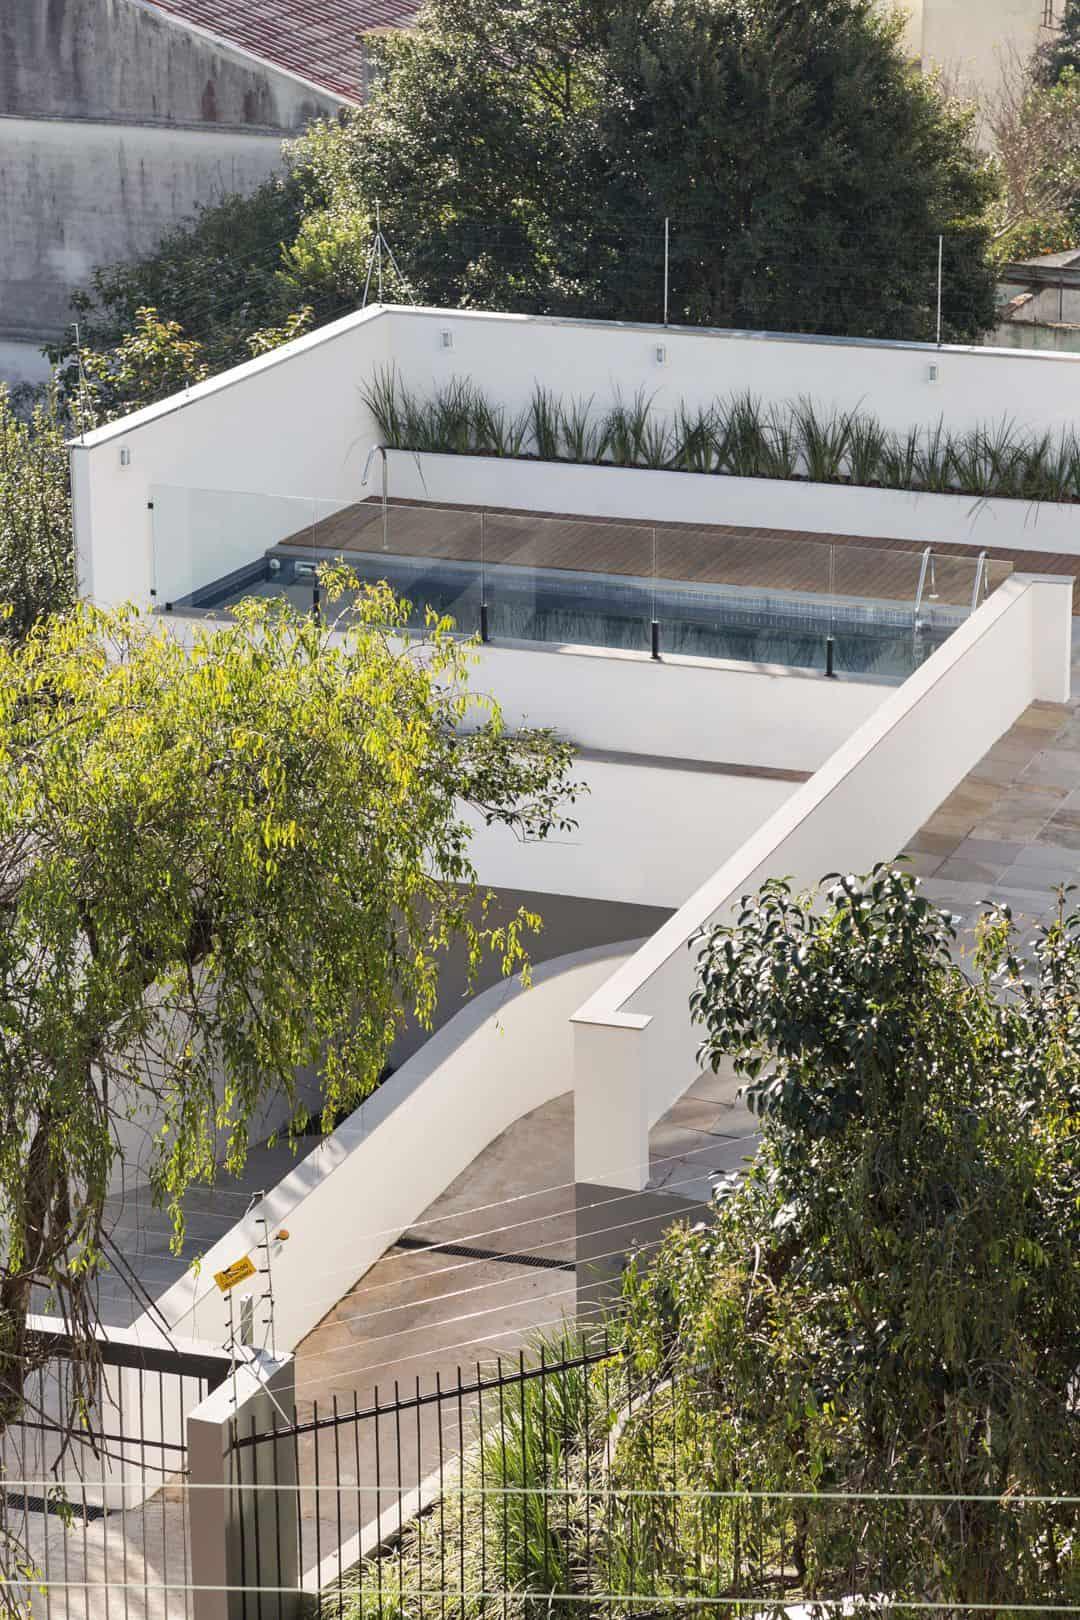 Fernando Abbott 866 A High Rise Residential Building In Porto Alegre 9